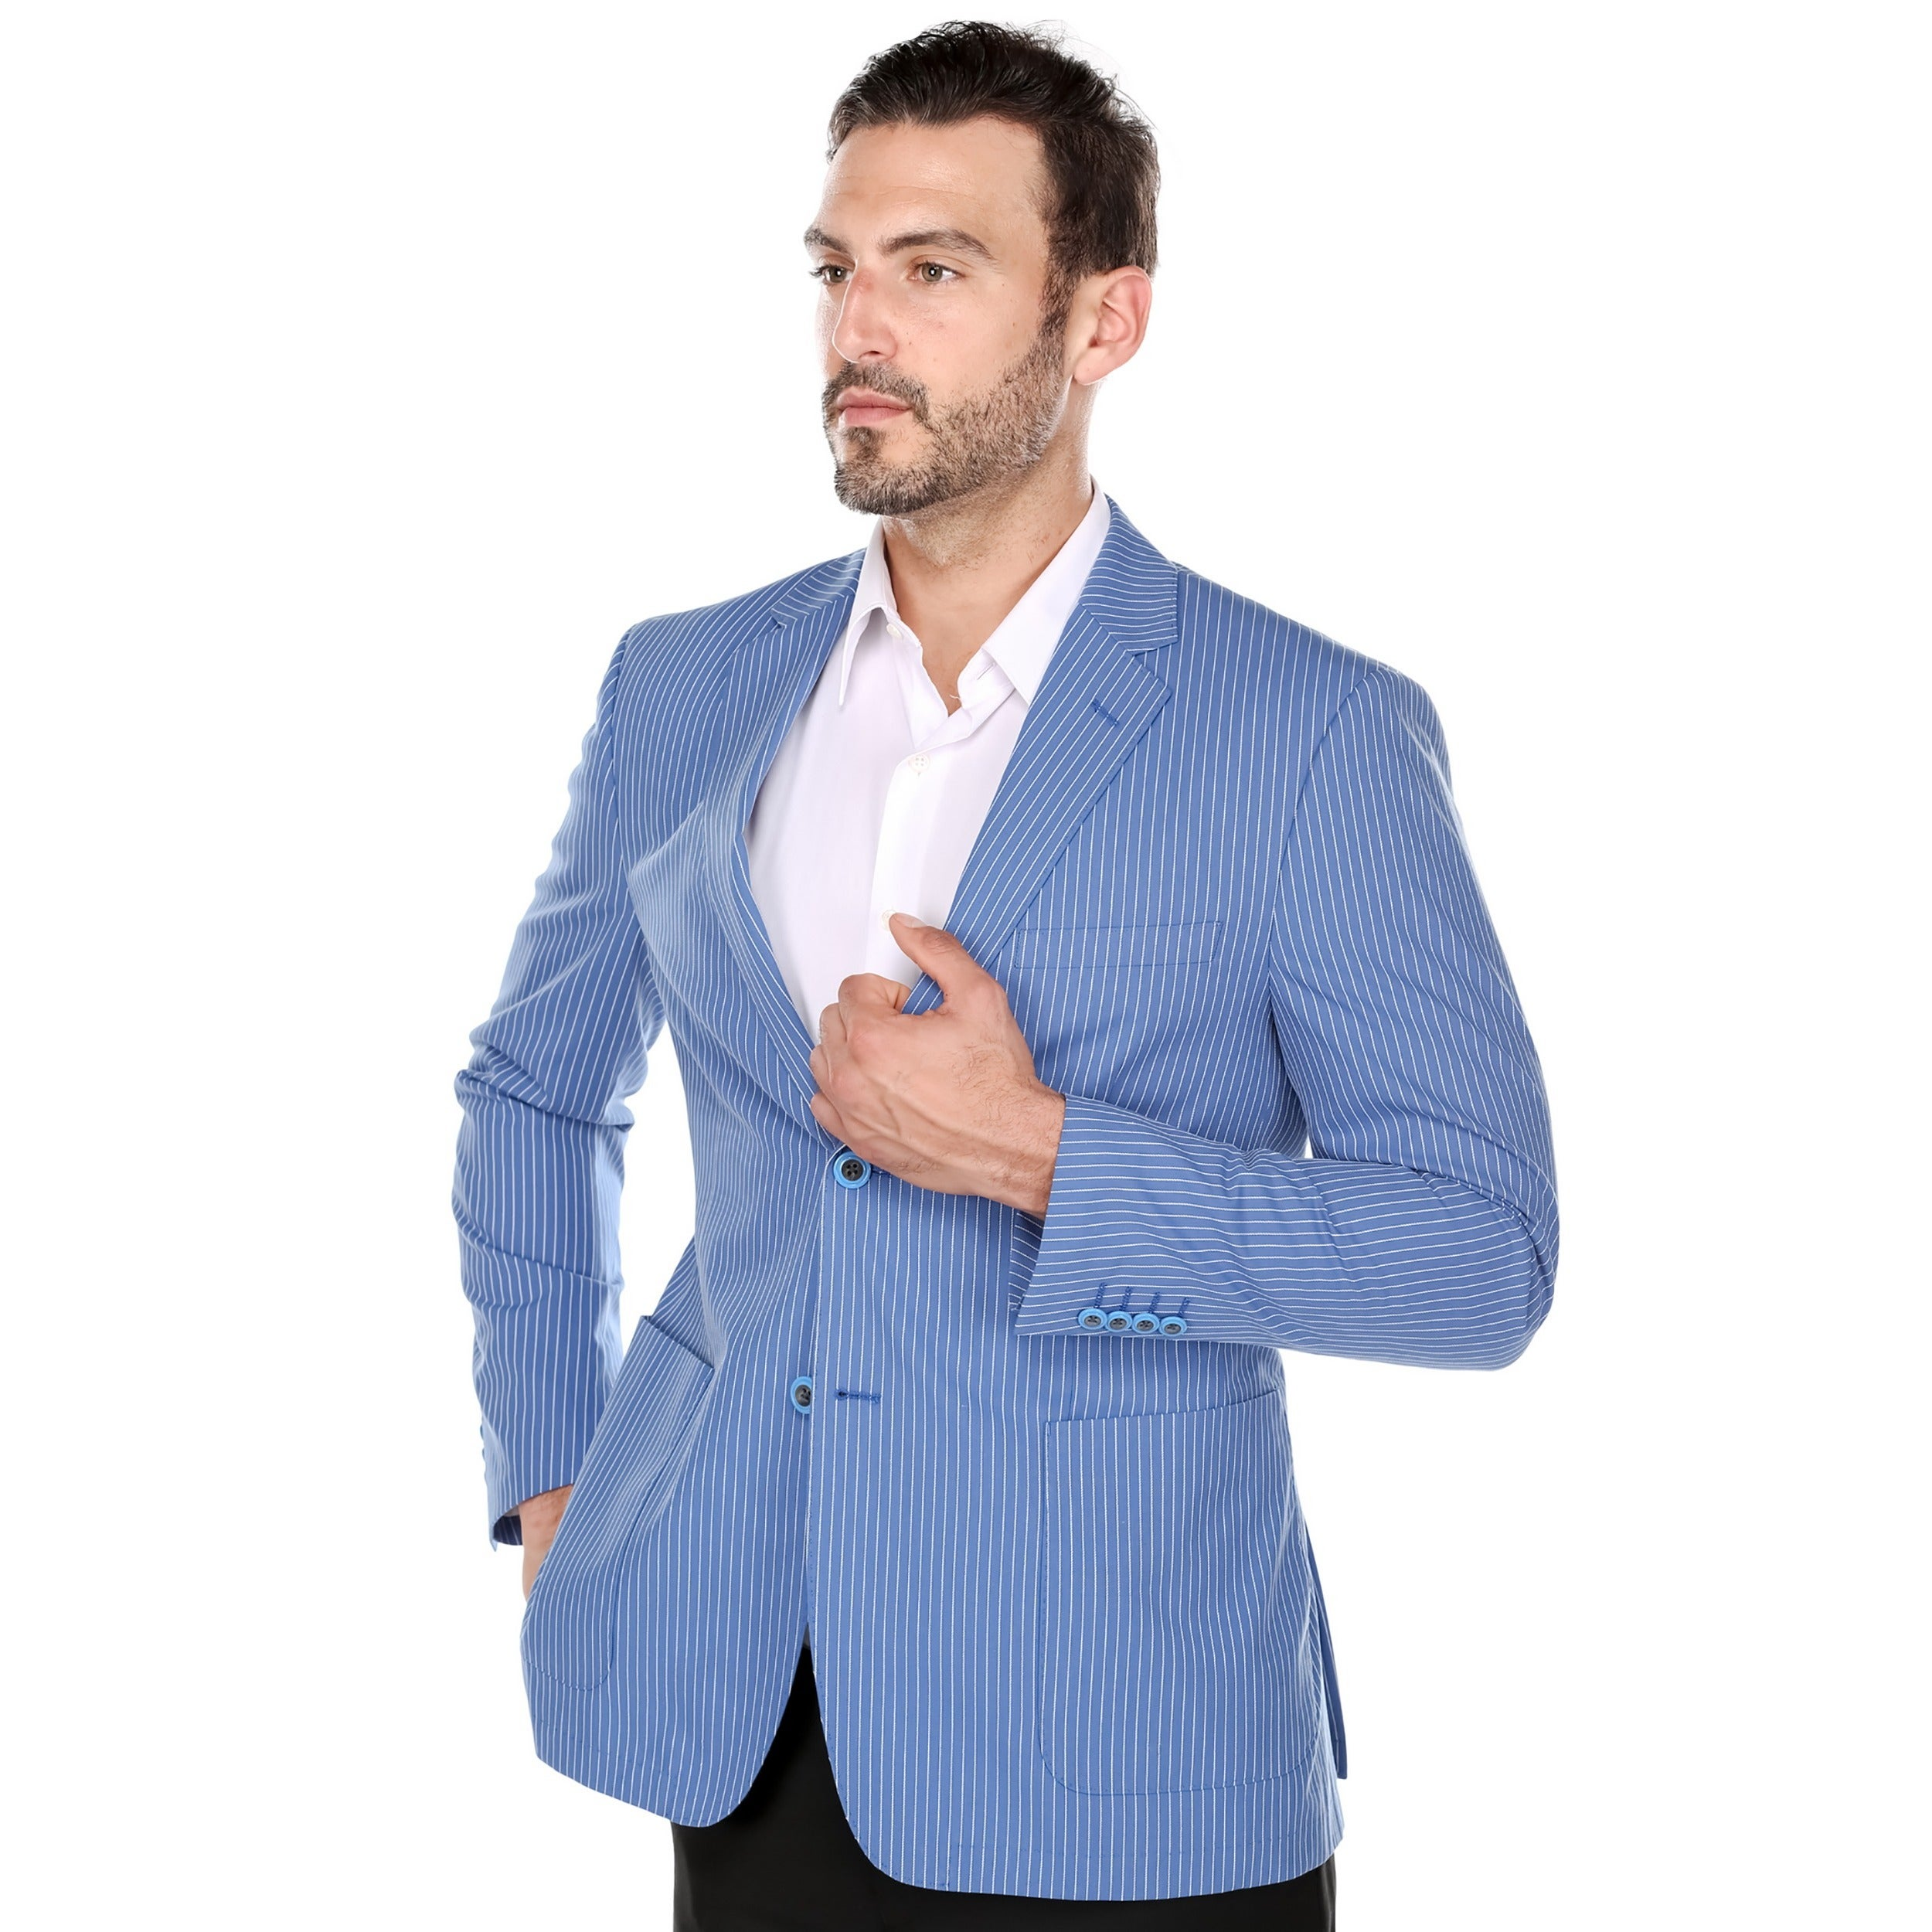 Verno Zanobi Men's Summer Blue and White Textured Pinstri...